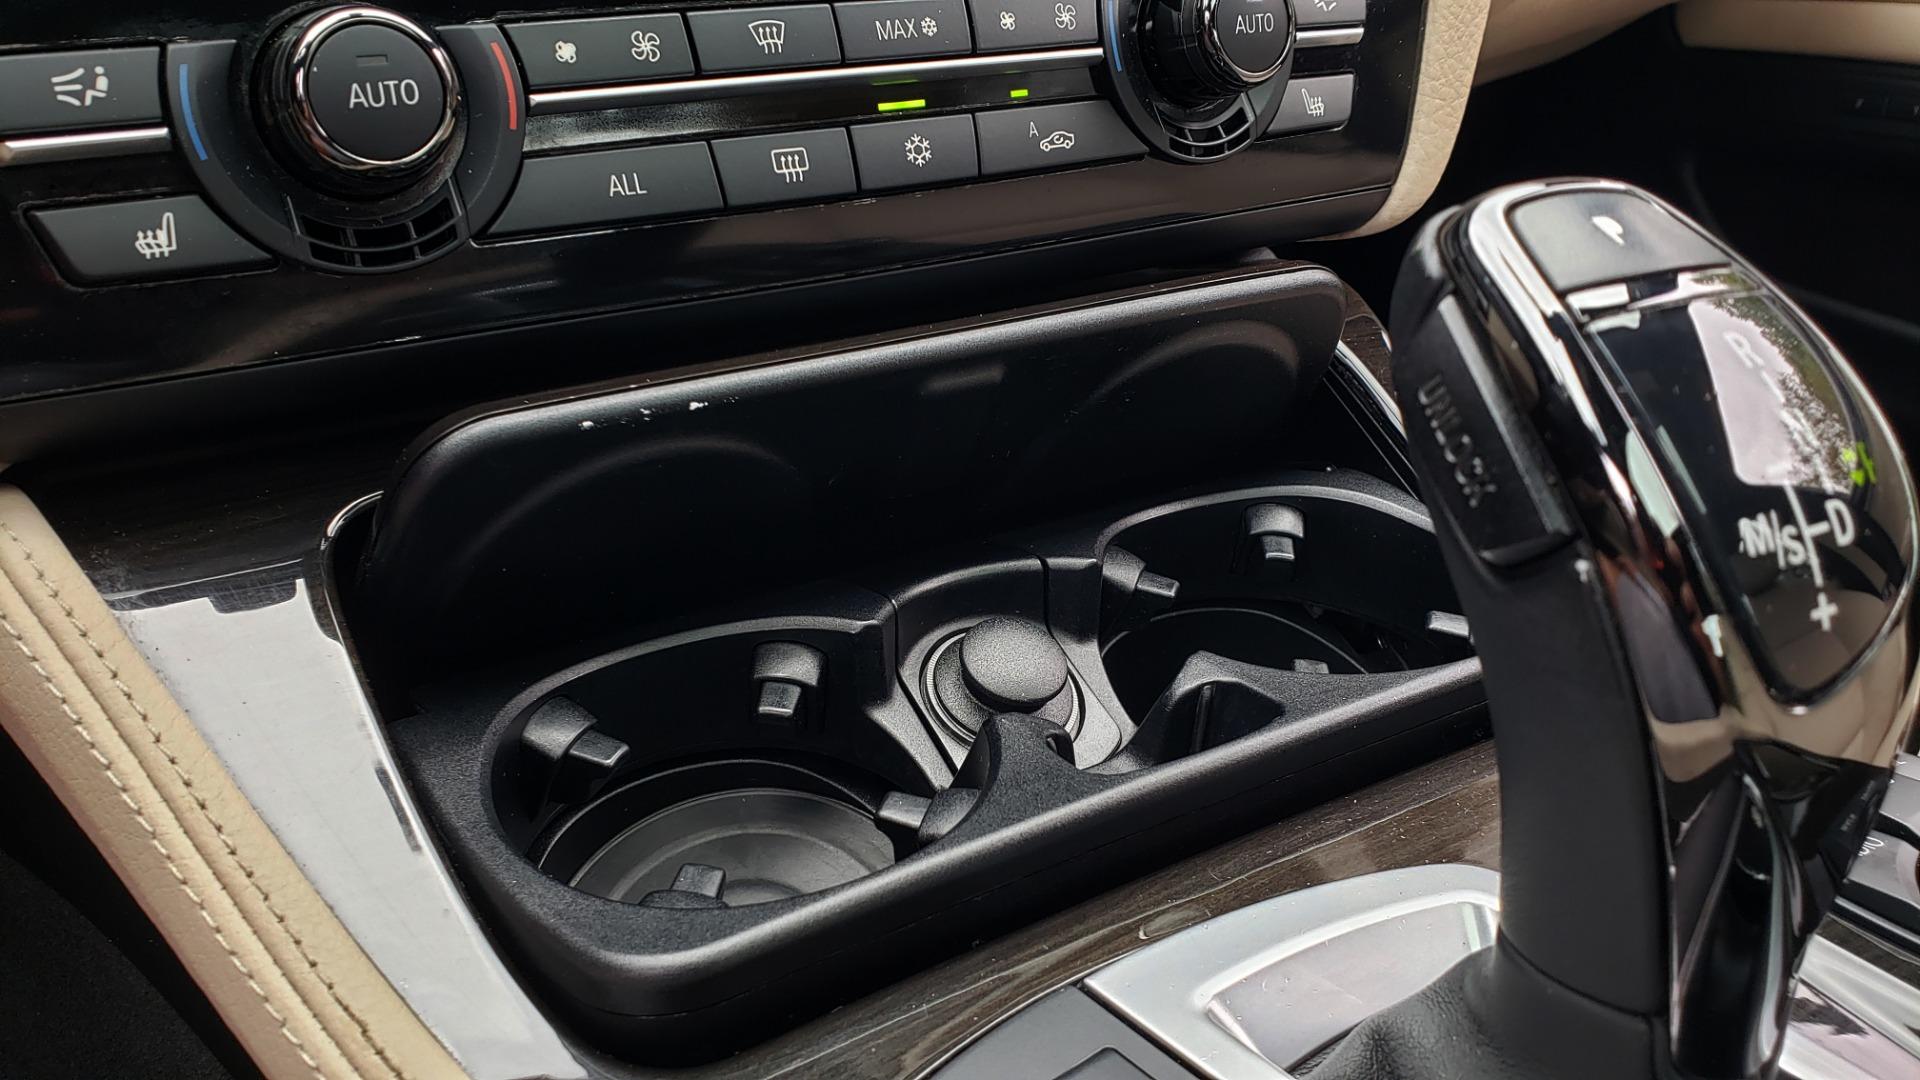 Used 2012 BMW 5 SERIES 550I M SPORT / NAV / CONV PKG / SUNROOF / PREM SND / REARVIEW for sale Sold at Formula Imports in Charlotte NC 28227 41